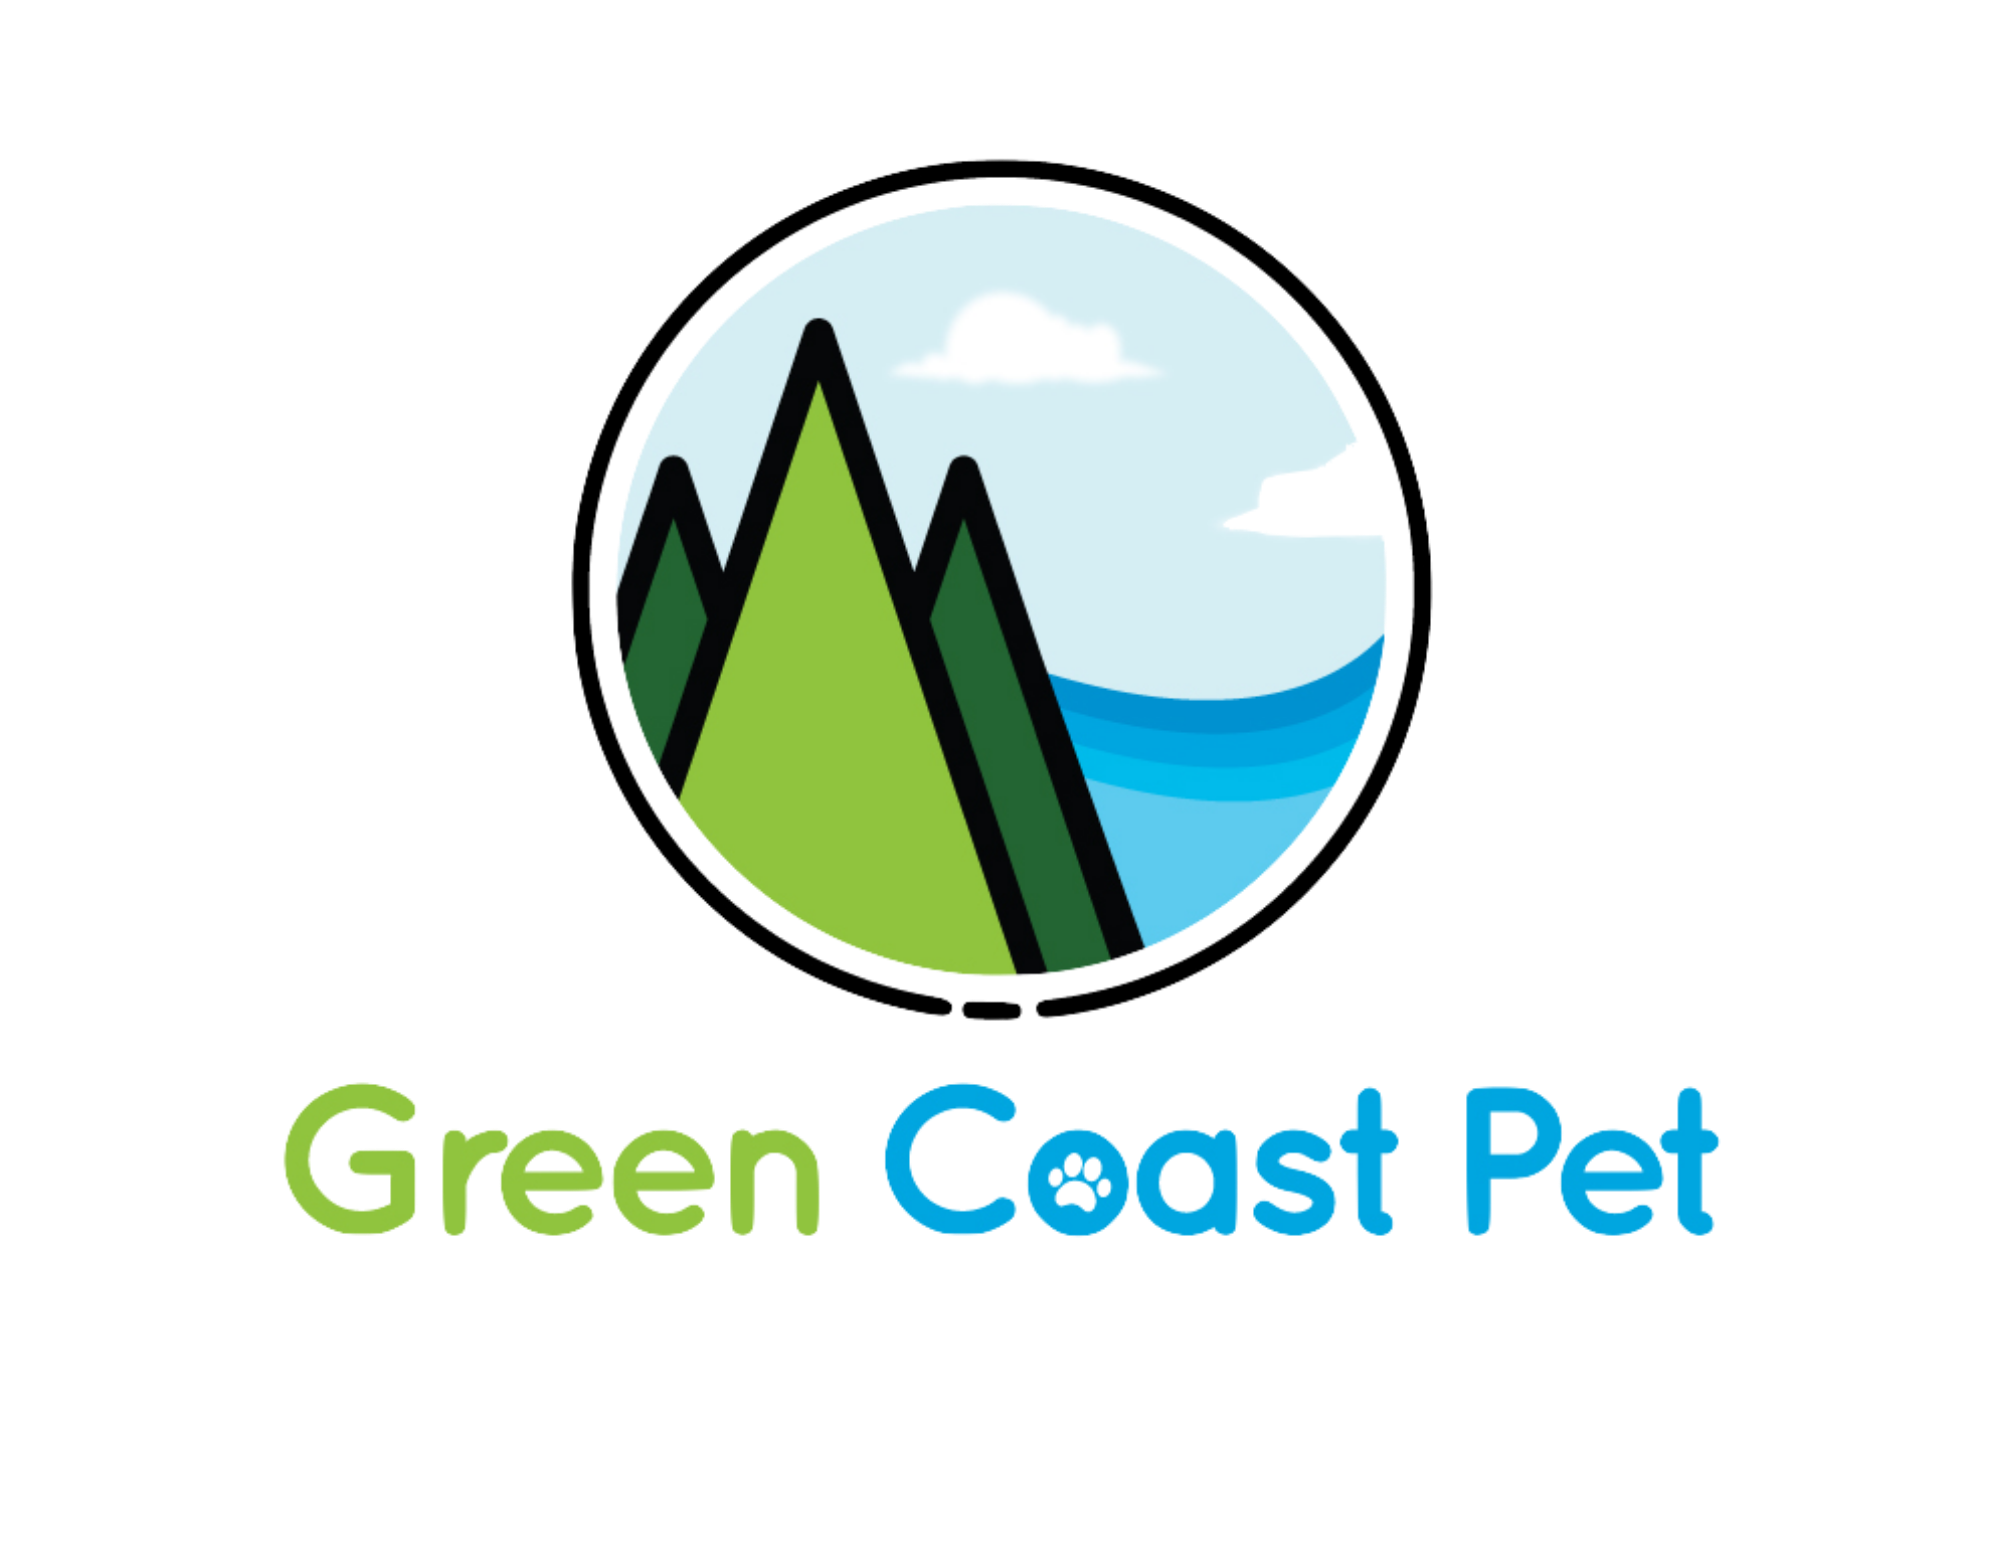 Green Coast Pet Logo Image